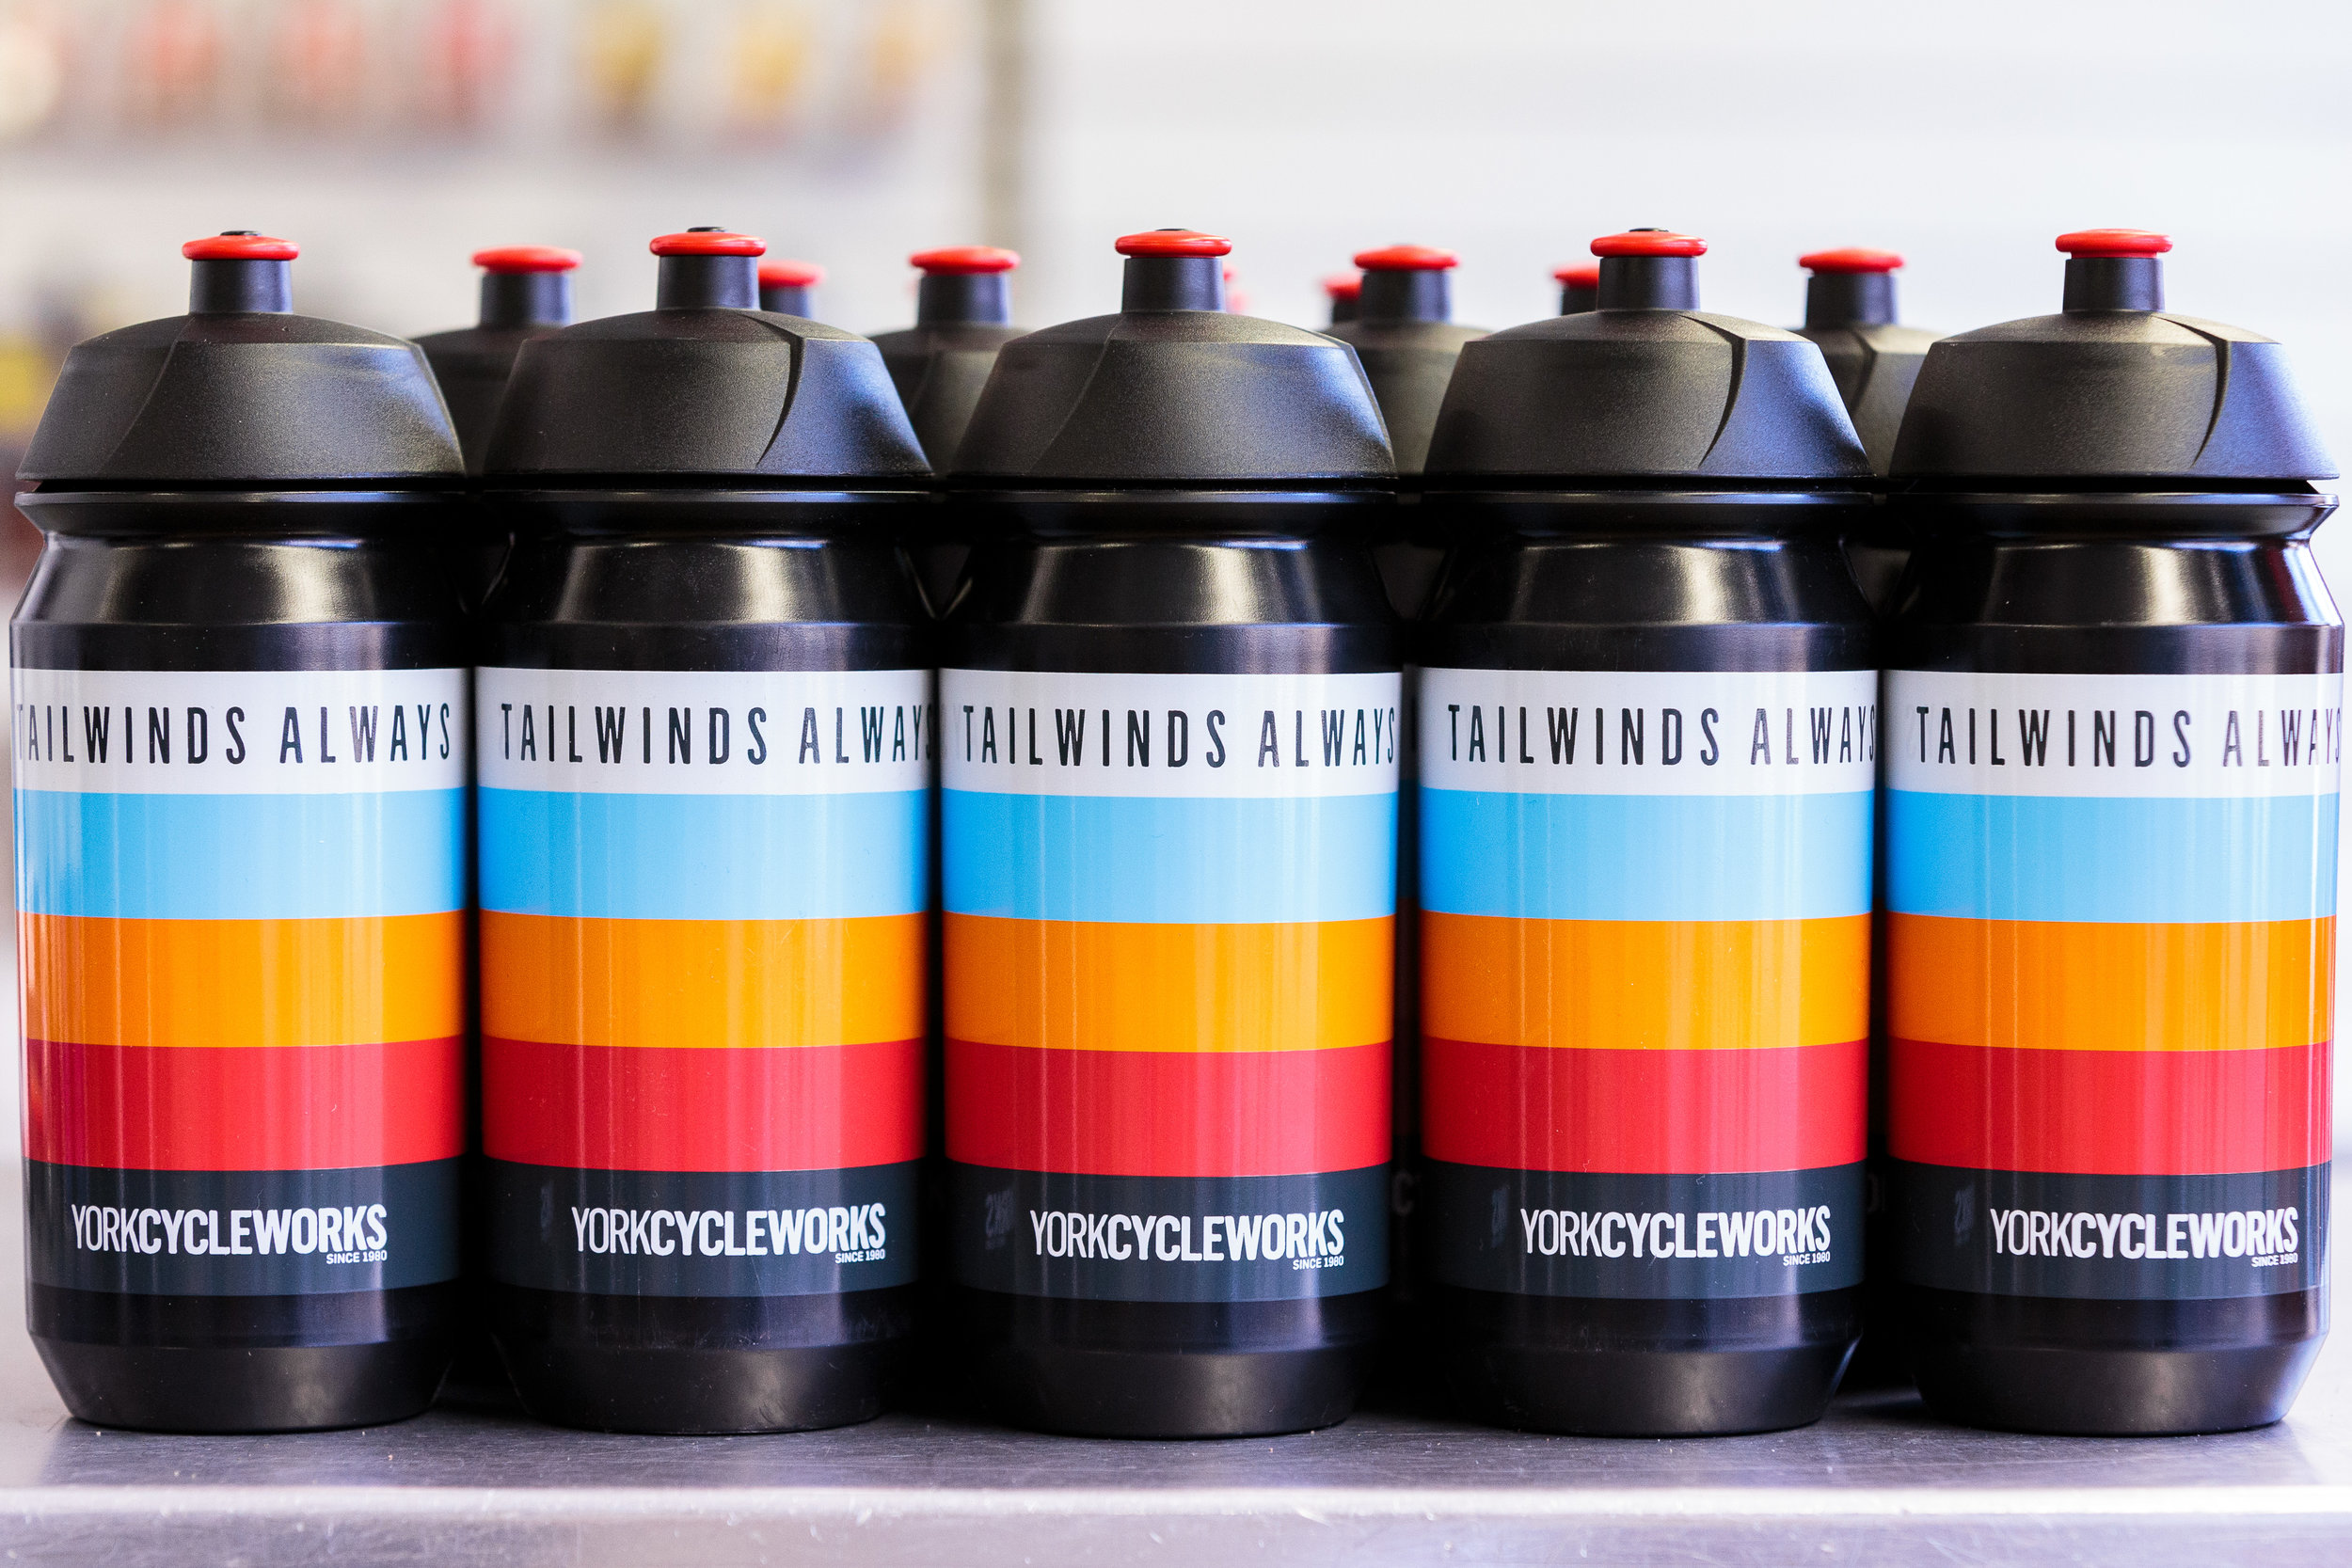 York Cycleworks Bottles